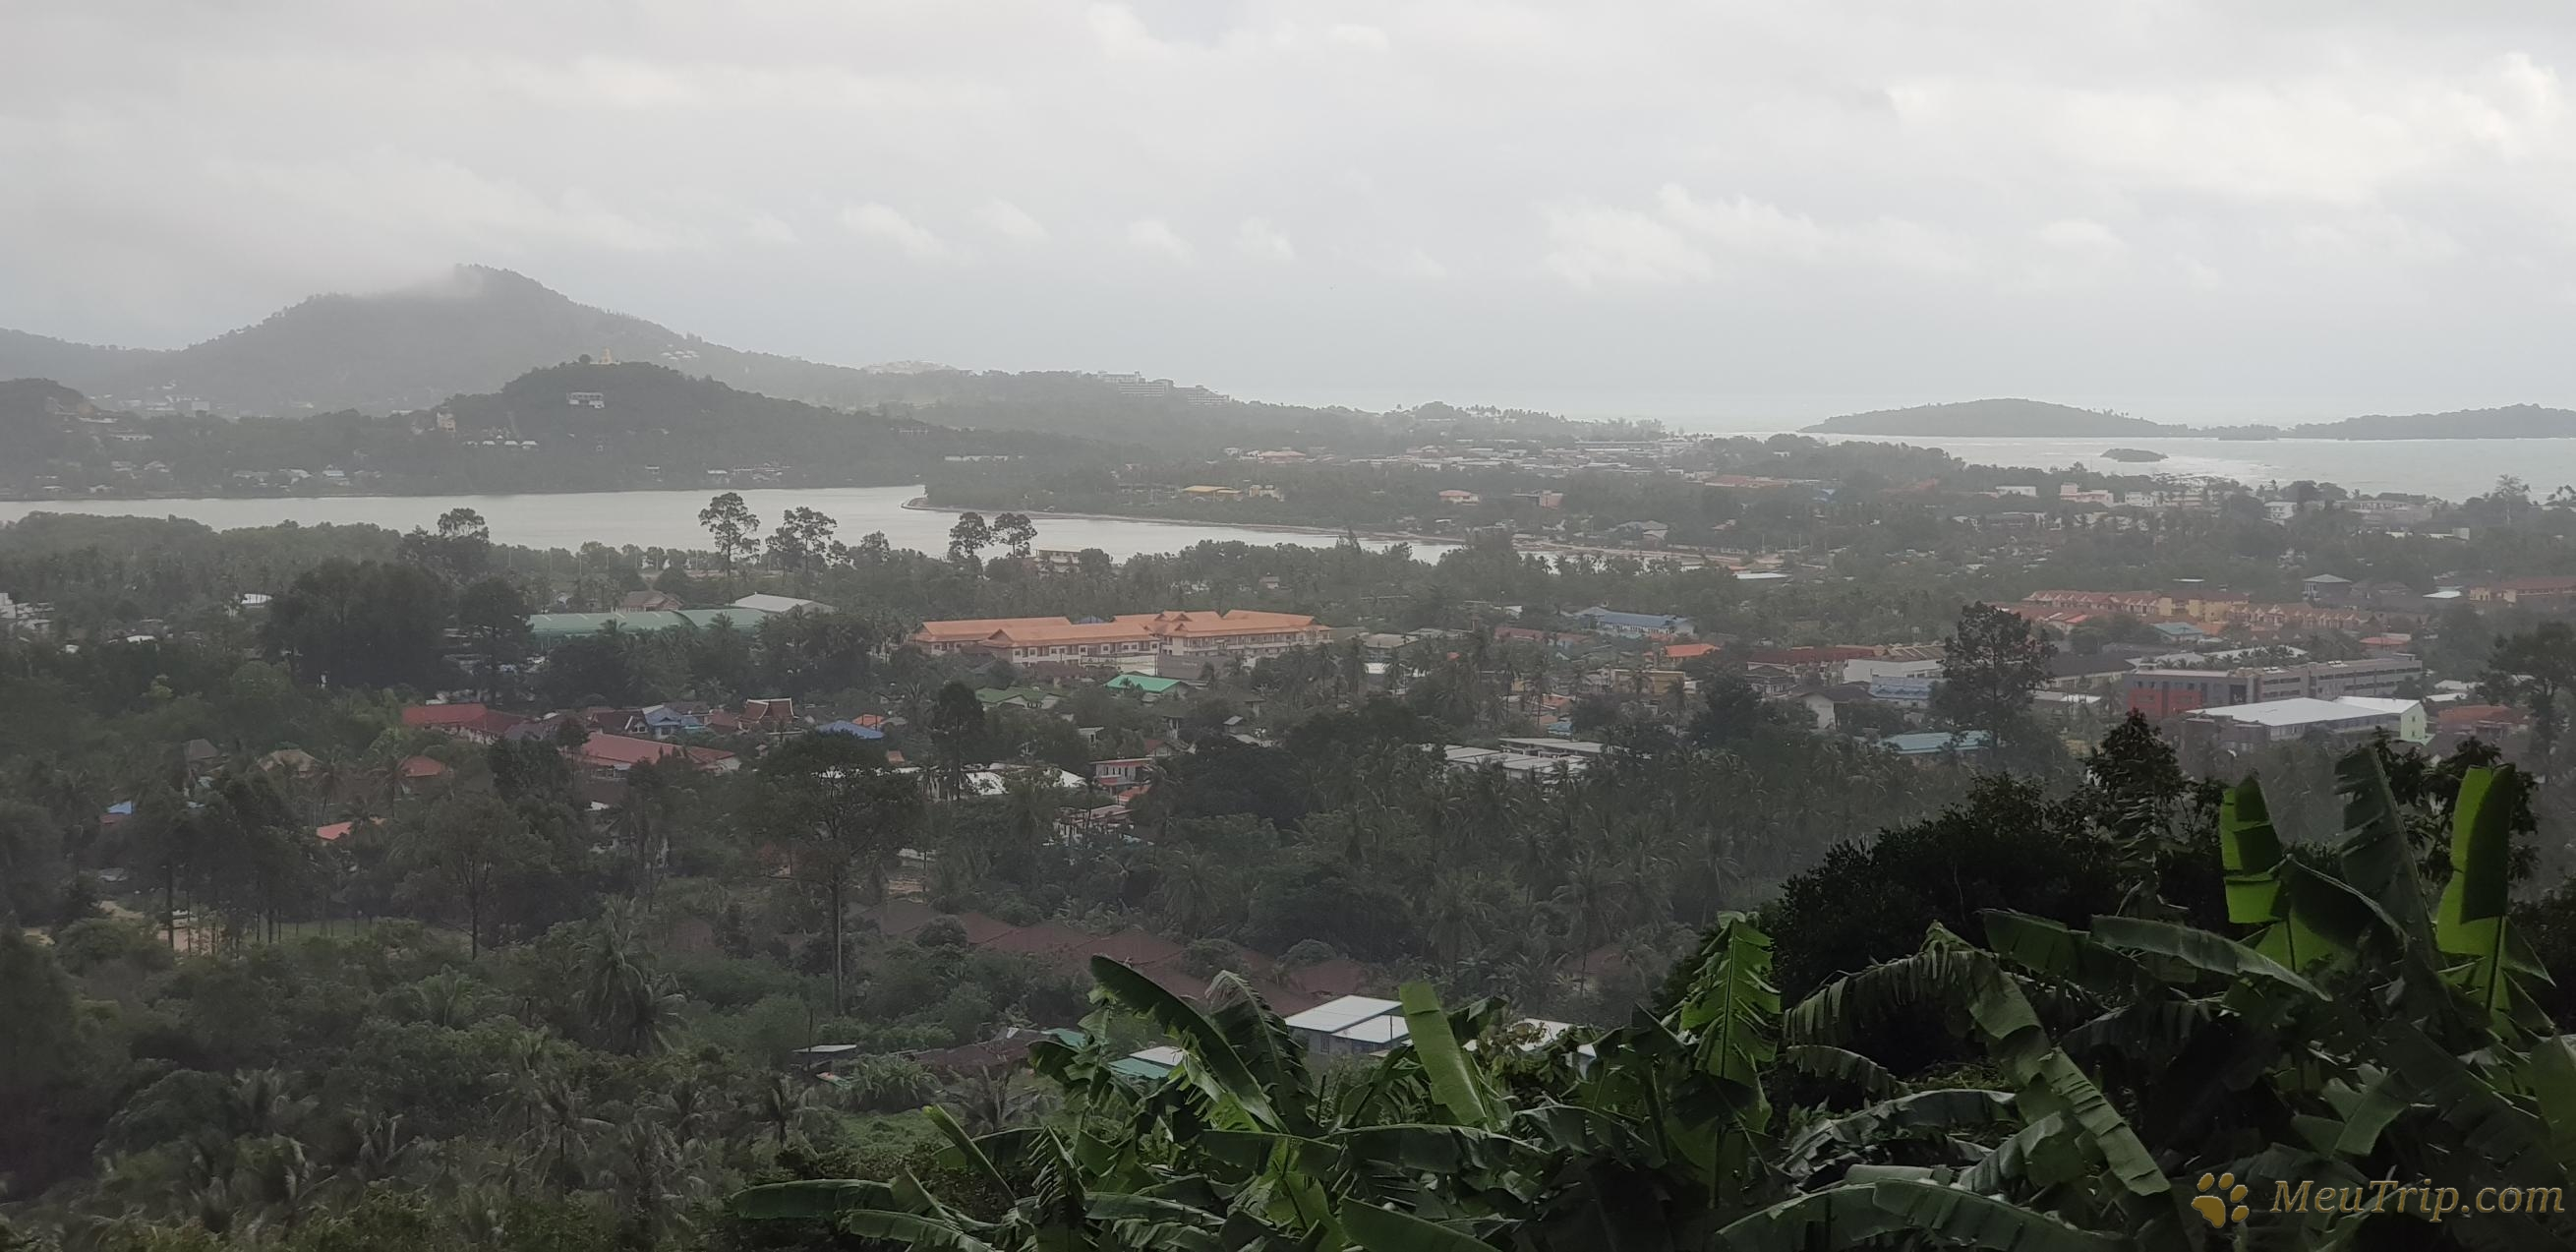 Тропический шторм в Таиланде онлайн, 5 января 2019